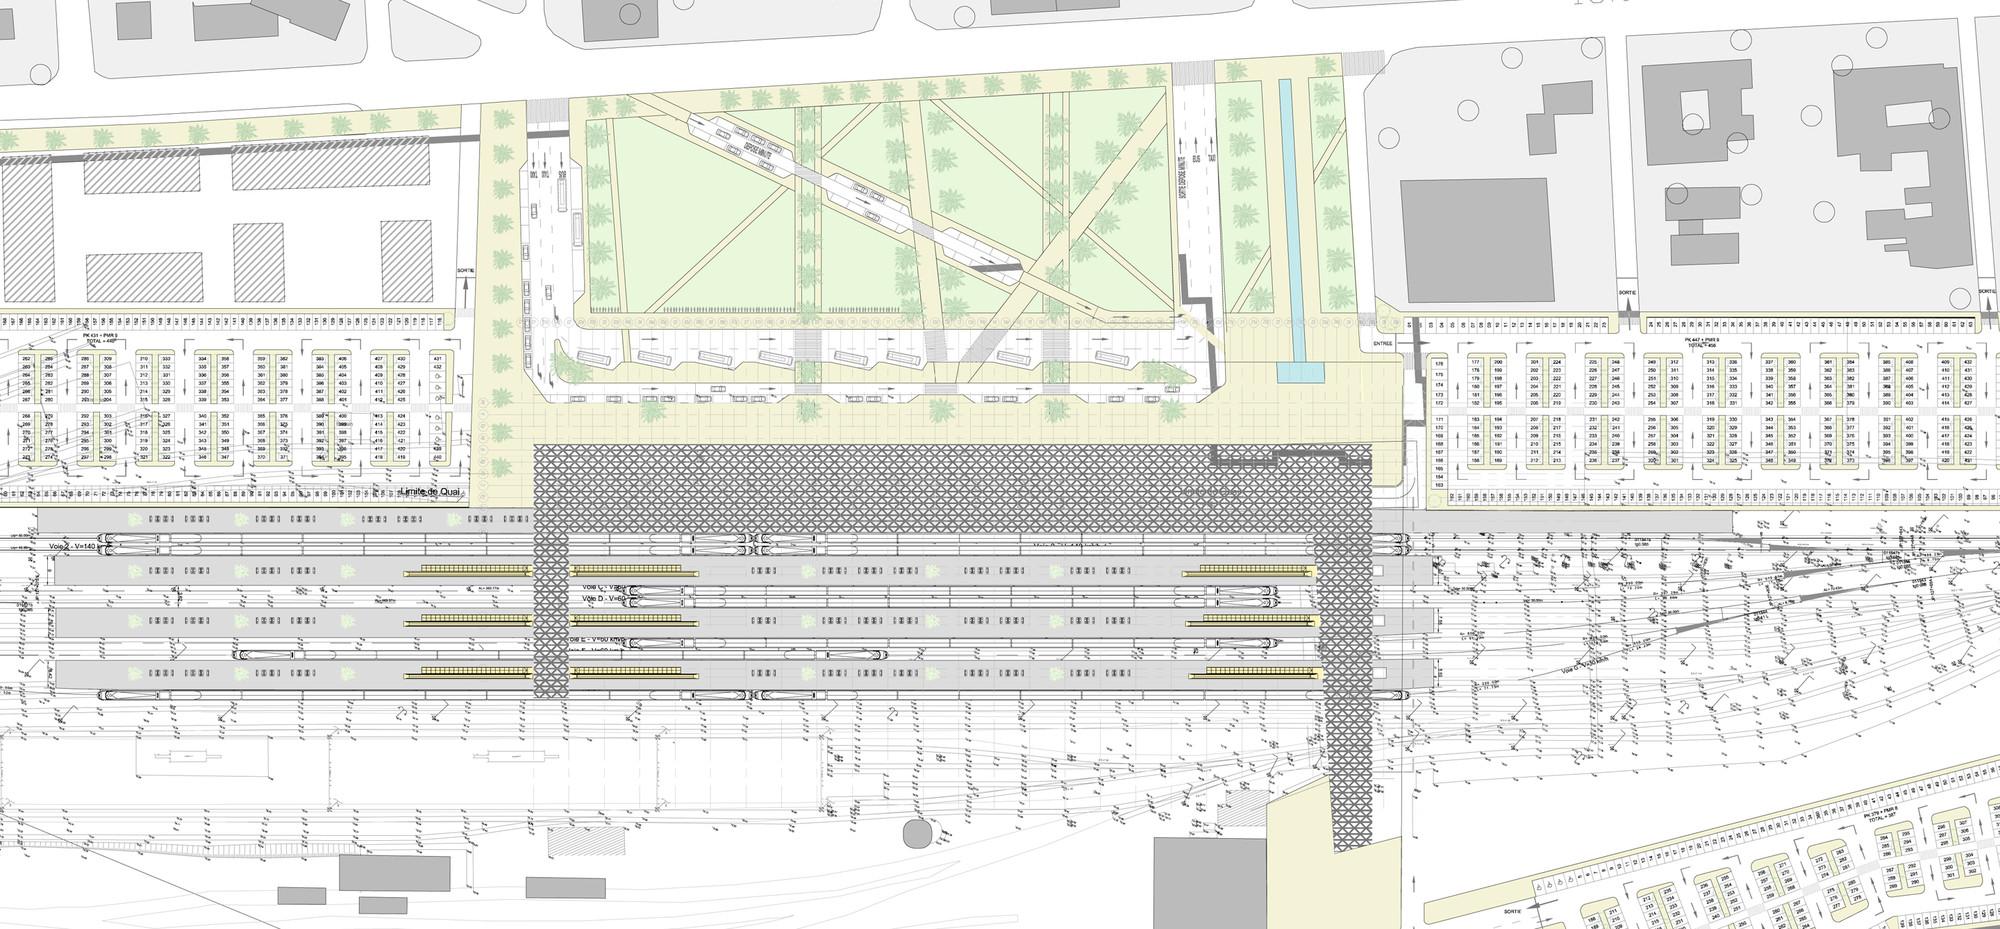 Silvio Du0027Ascia Wins Competition To Design Morocco Rail Station,Site Plan  With Urban